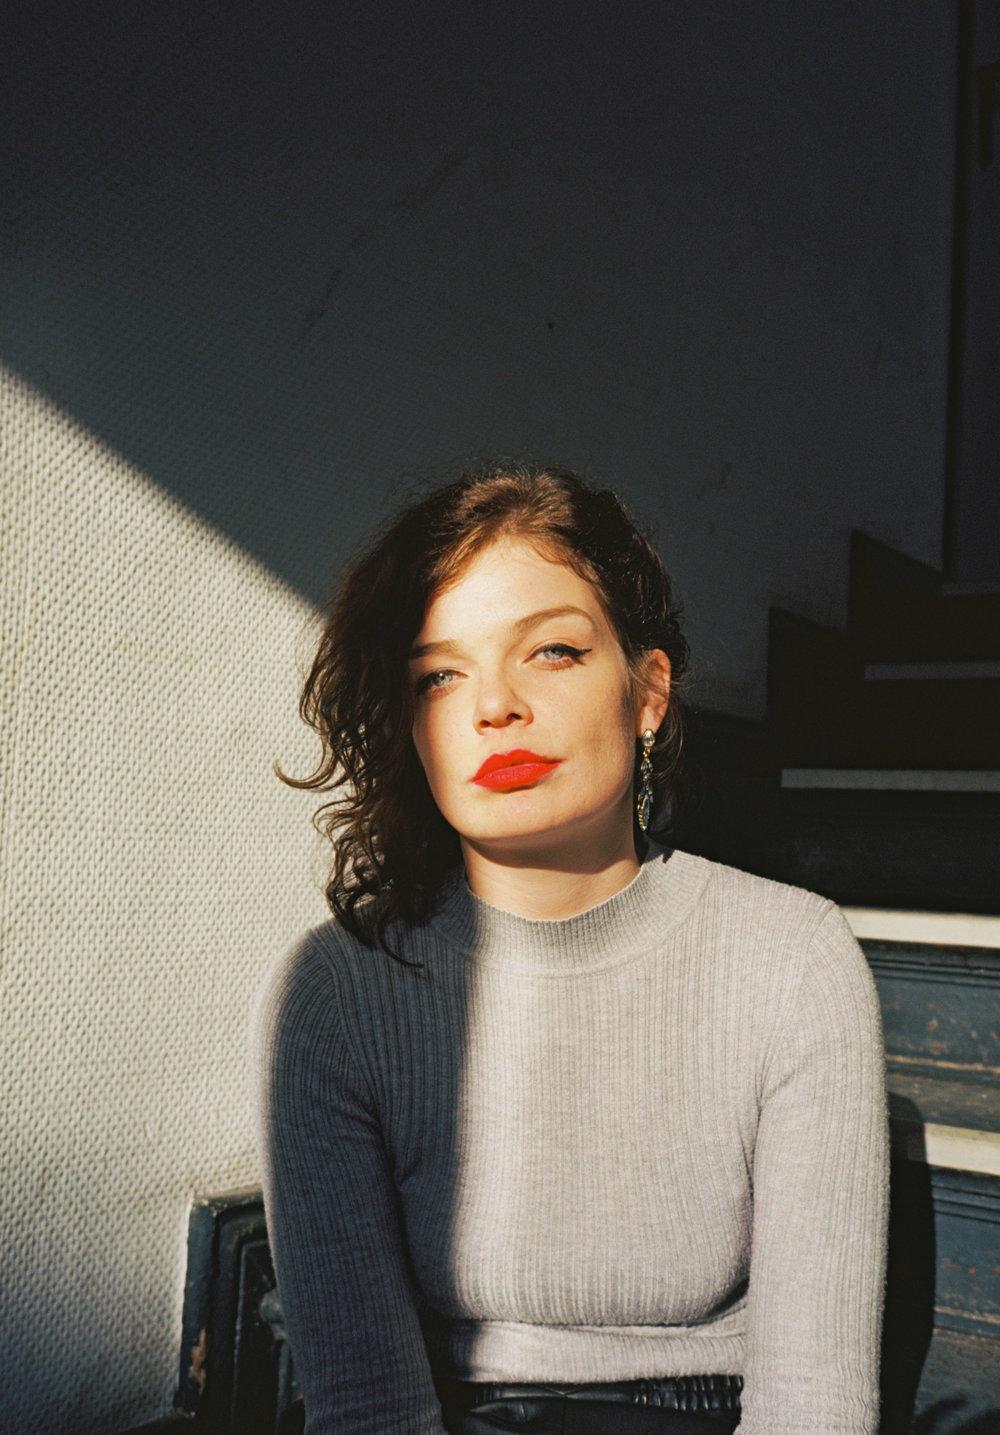 Megan-Courtis-givemesportbts